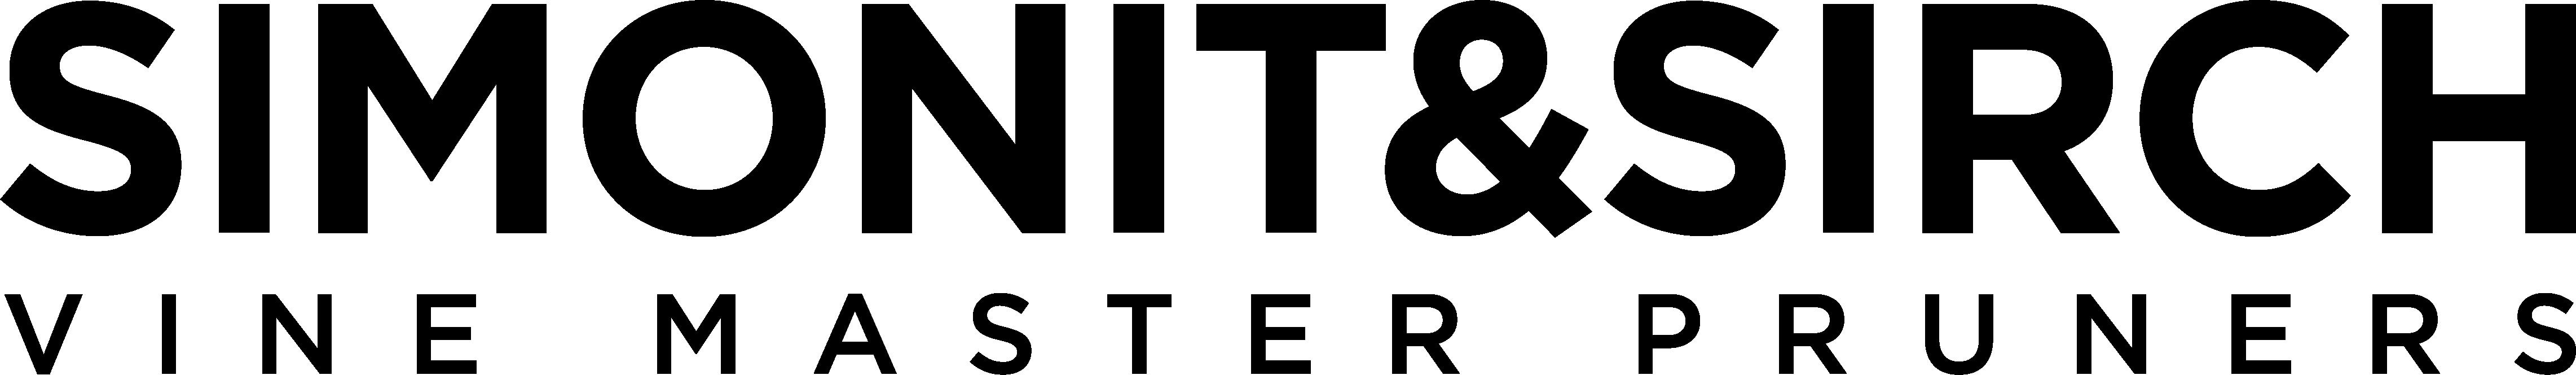 Logo_Vine_Master_Pruners_BLACK